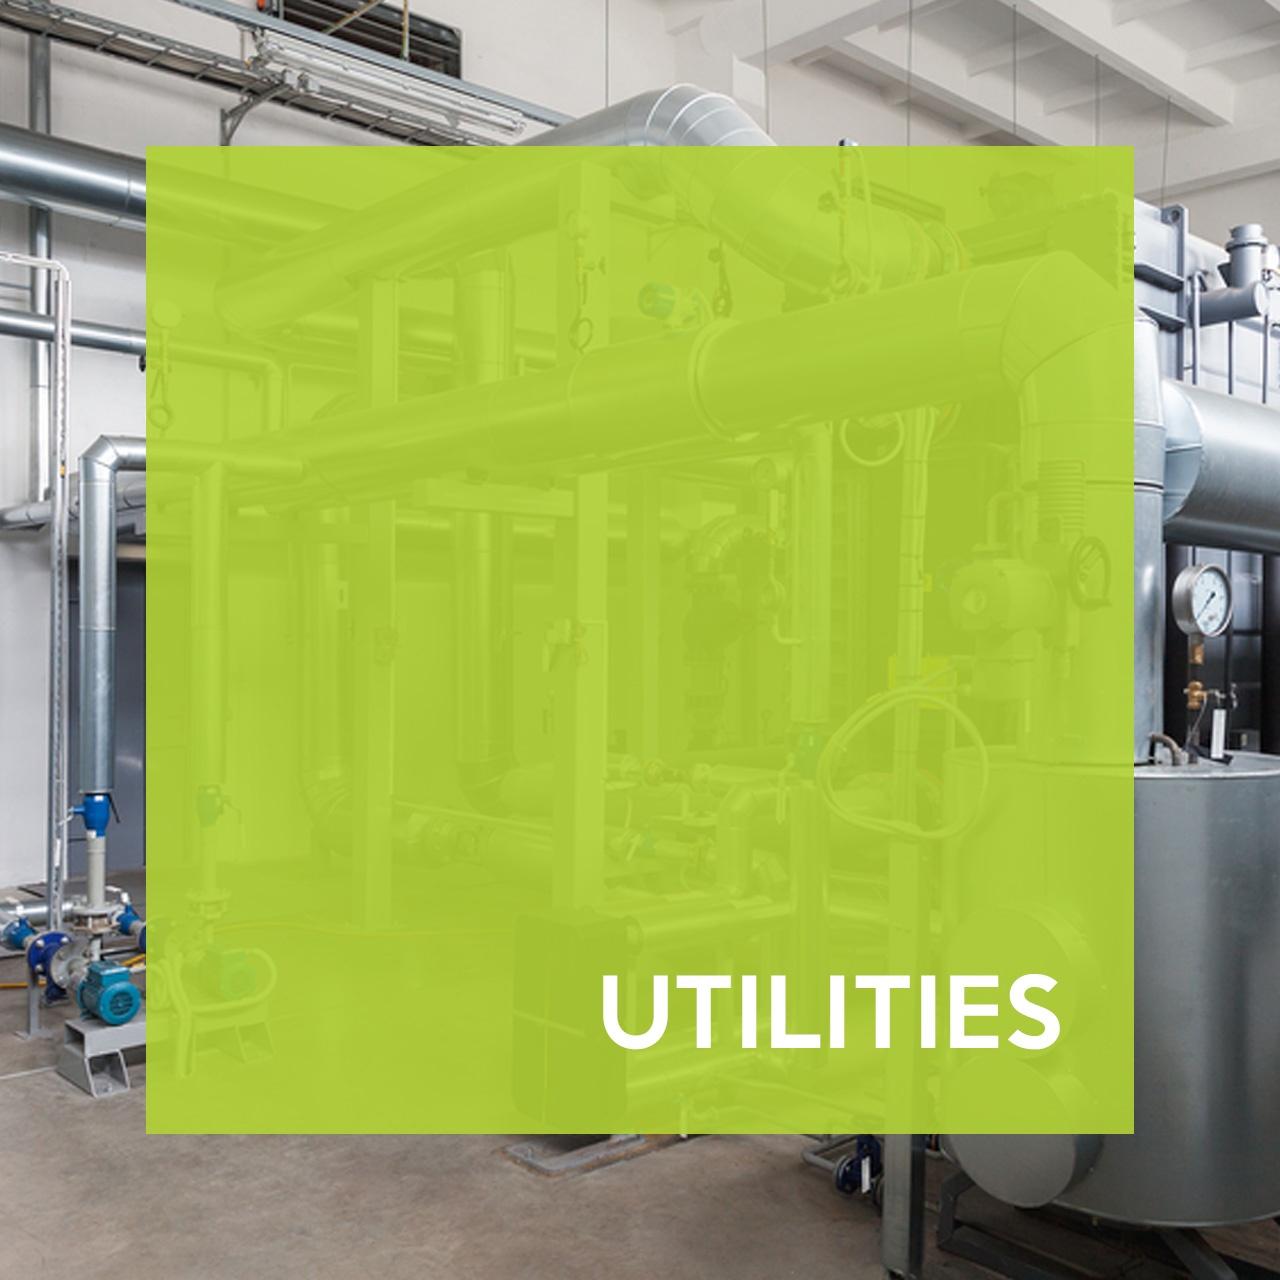 ami_commercial__utilities_-_018.jpg